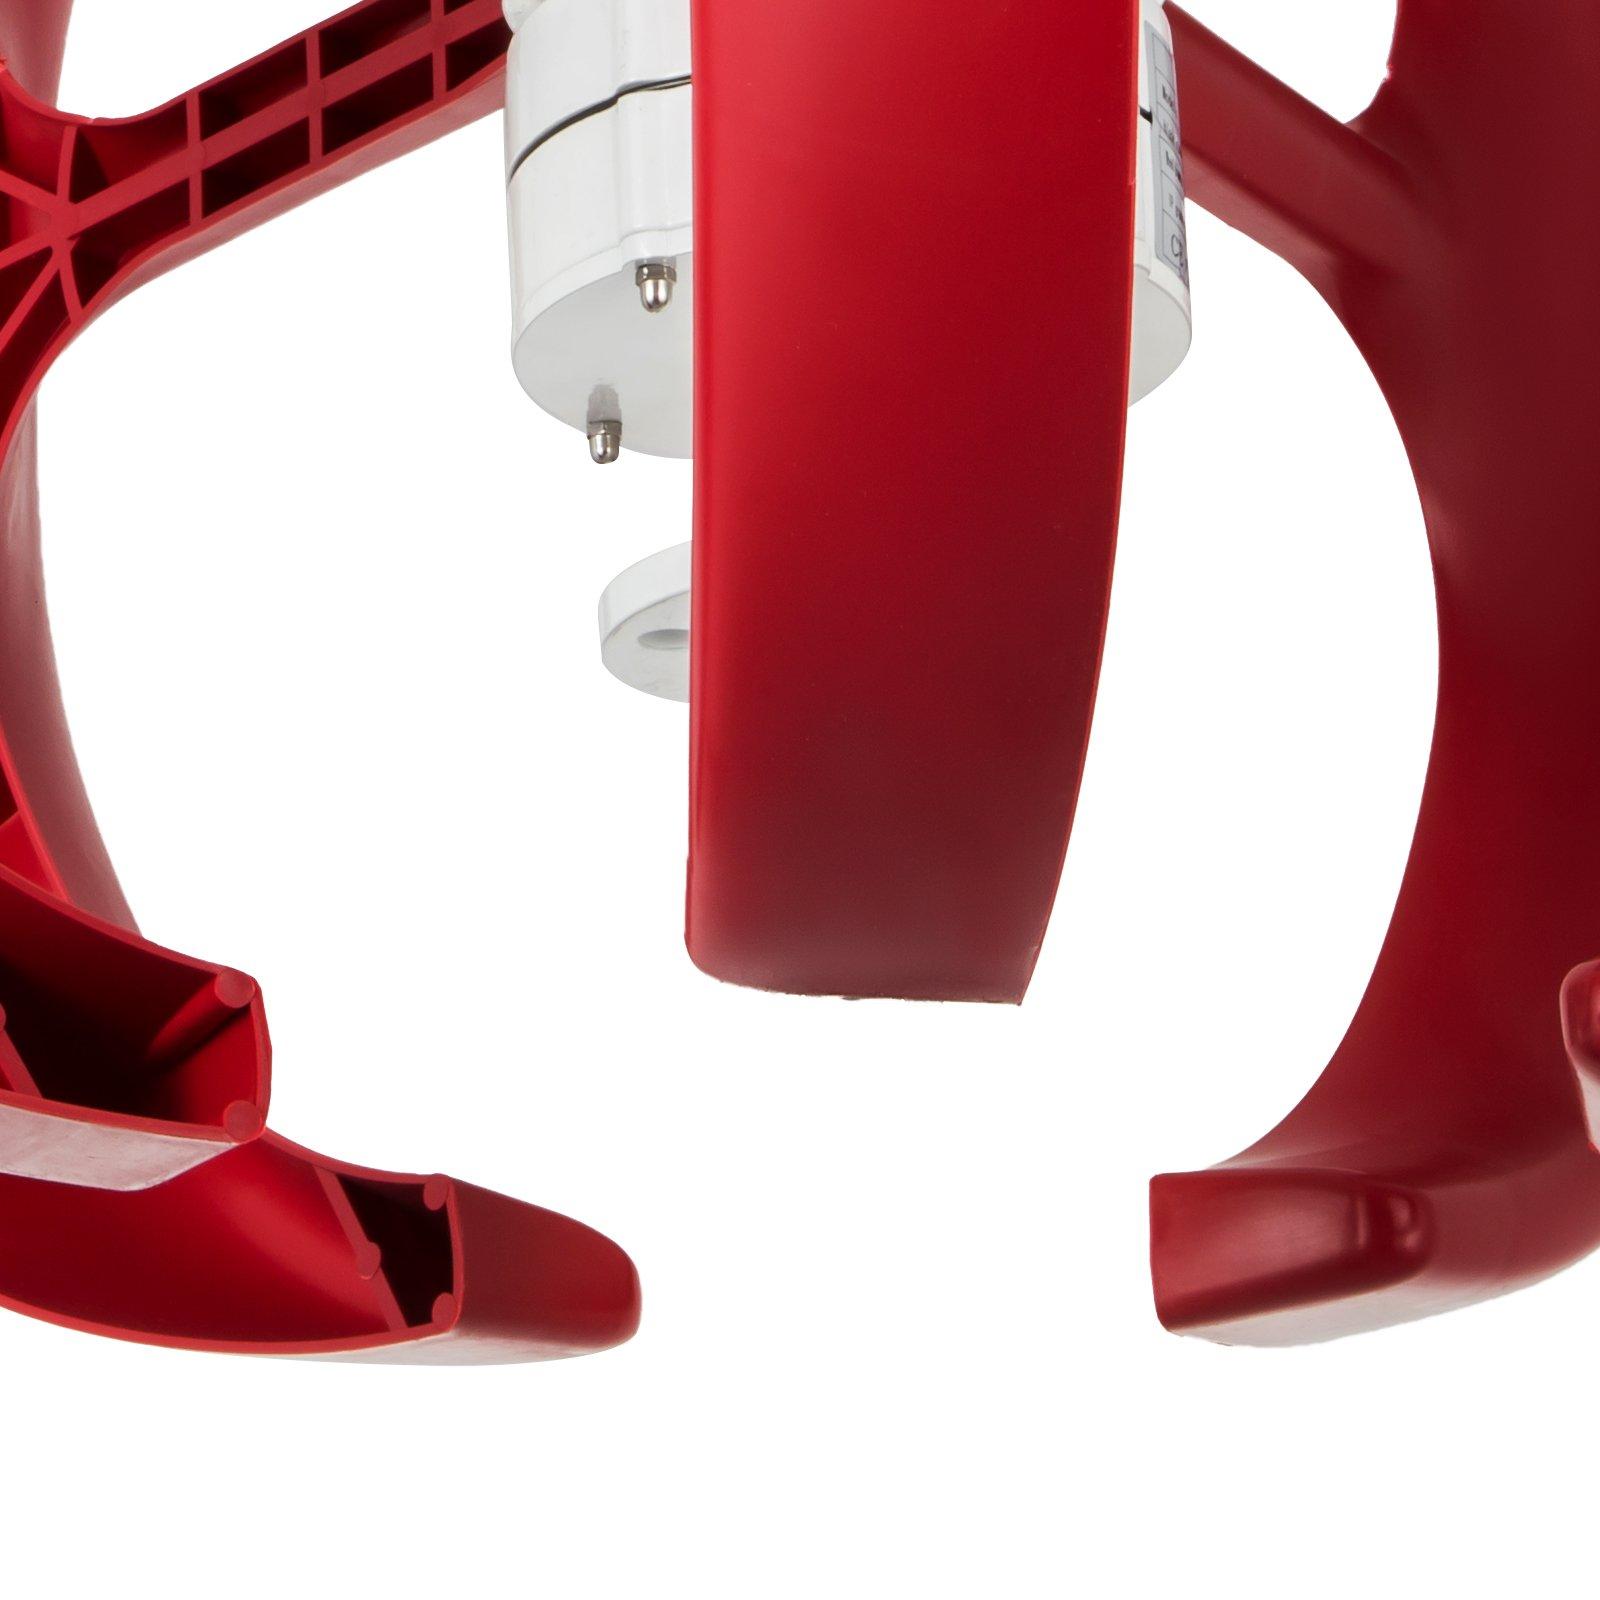 Happybuy Wind Turbine 300W 12V Wind Turbine Generator Red Lantern Vertical Wind Generator 5 Leaves Wind Turbine Kit with Controller No Pole (300W 12V, Red) by Happybuy (Image #8)